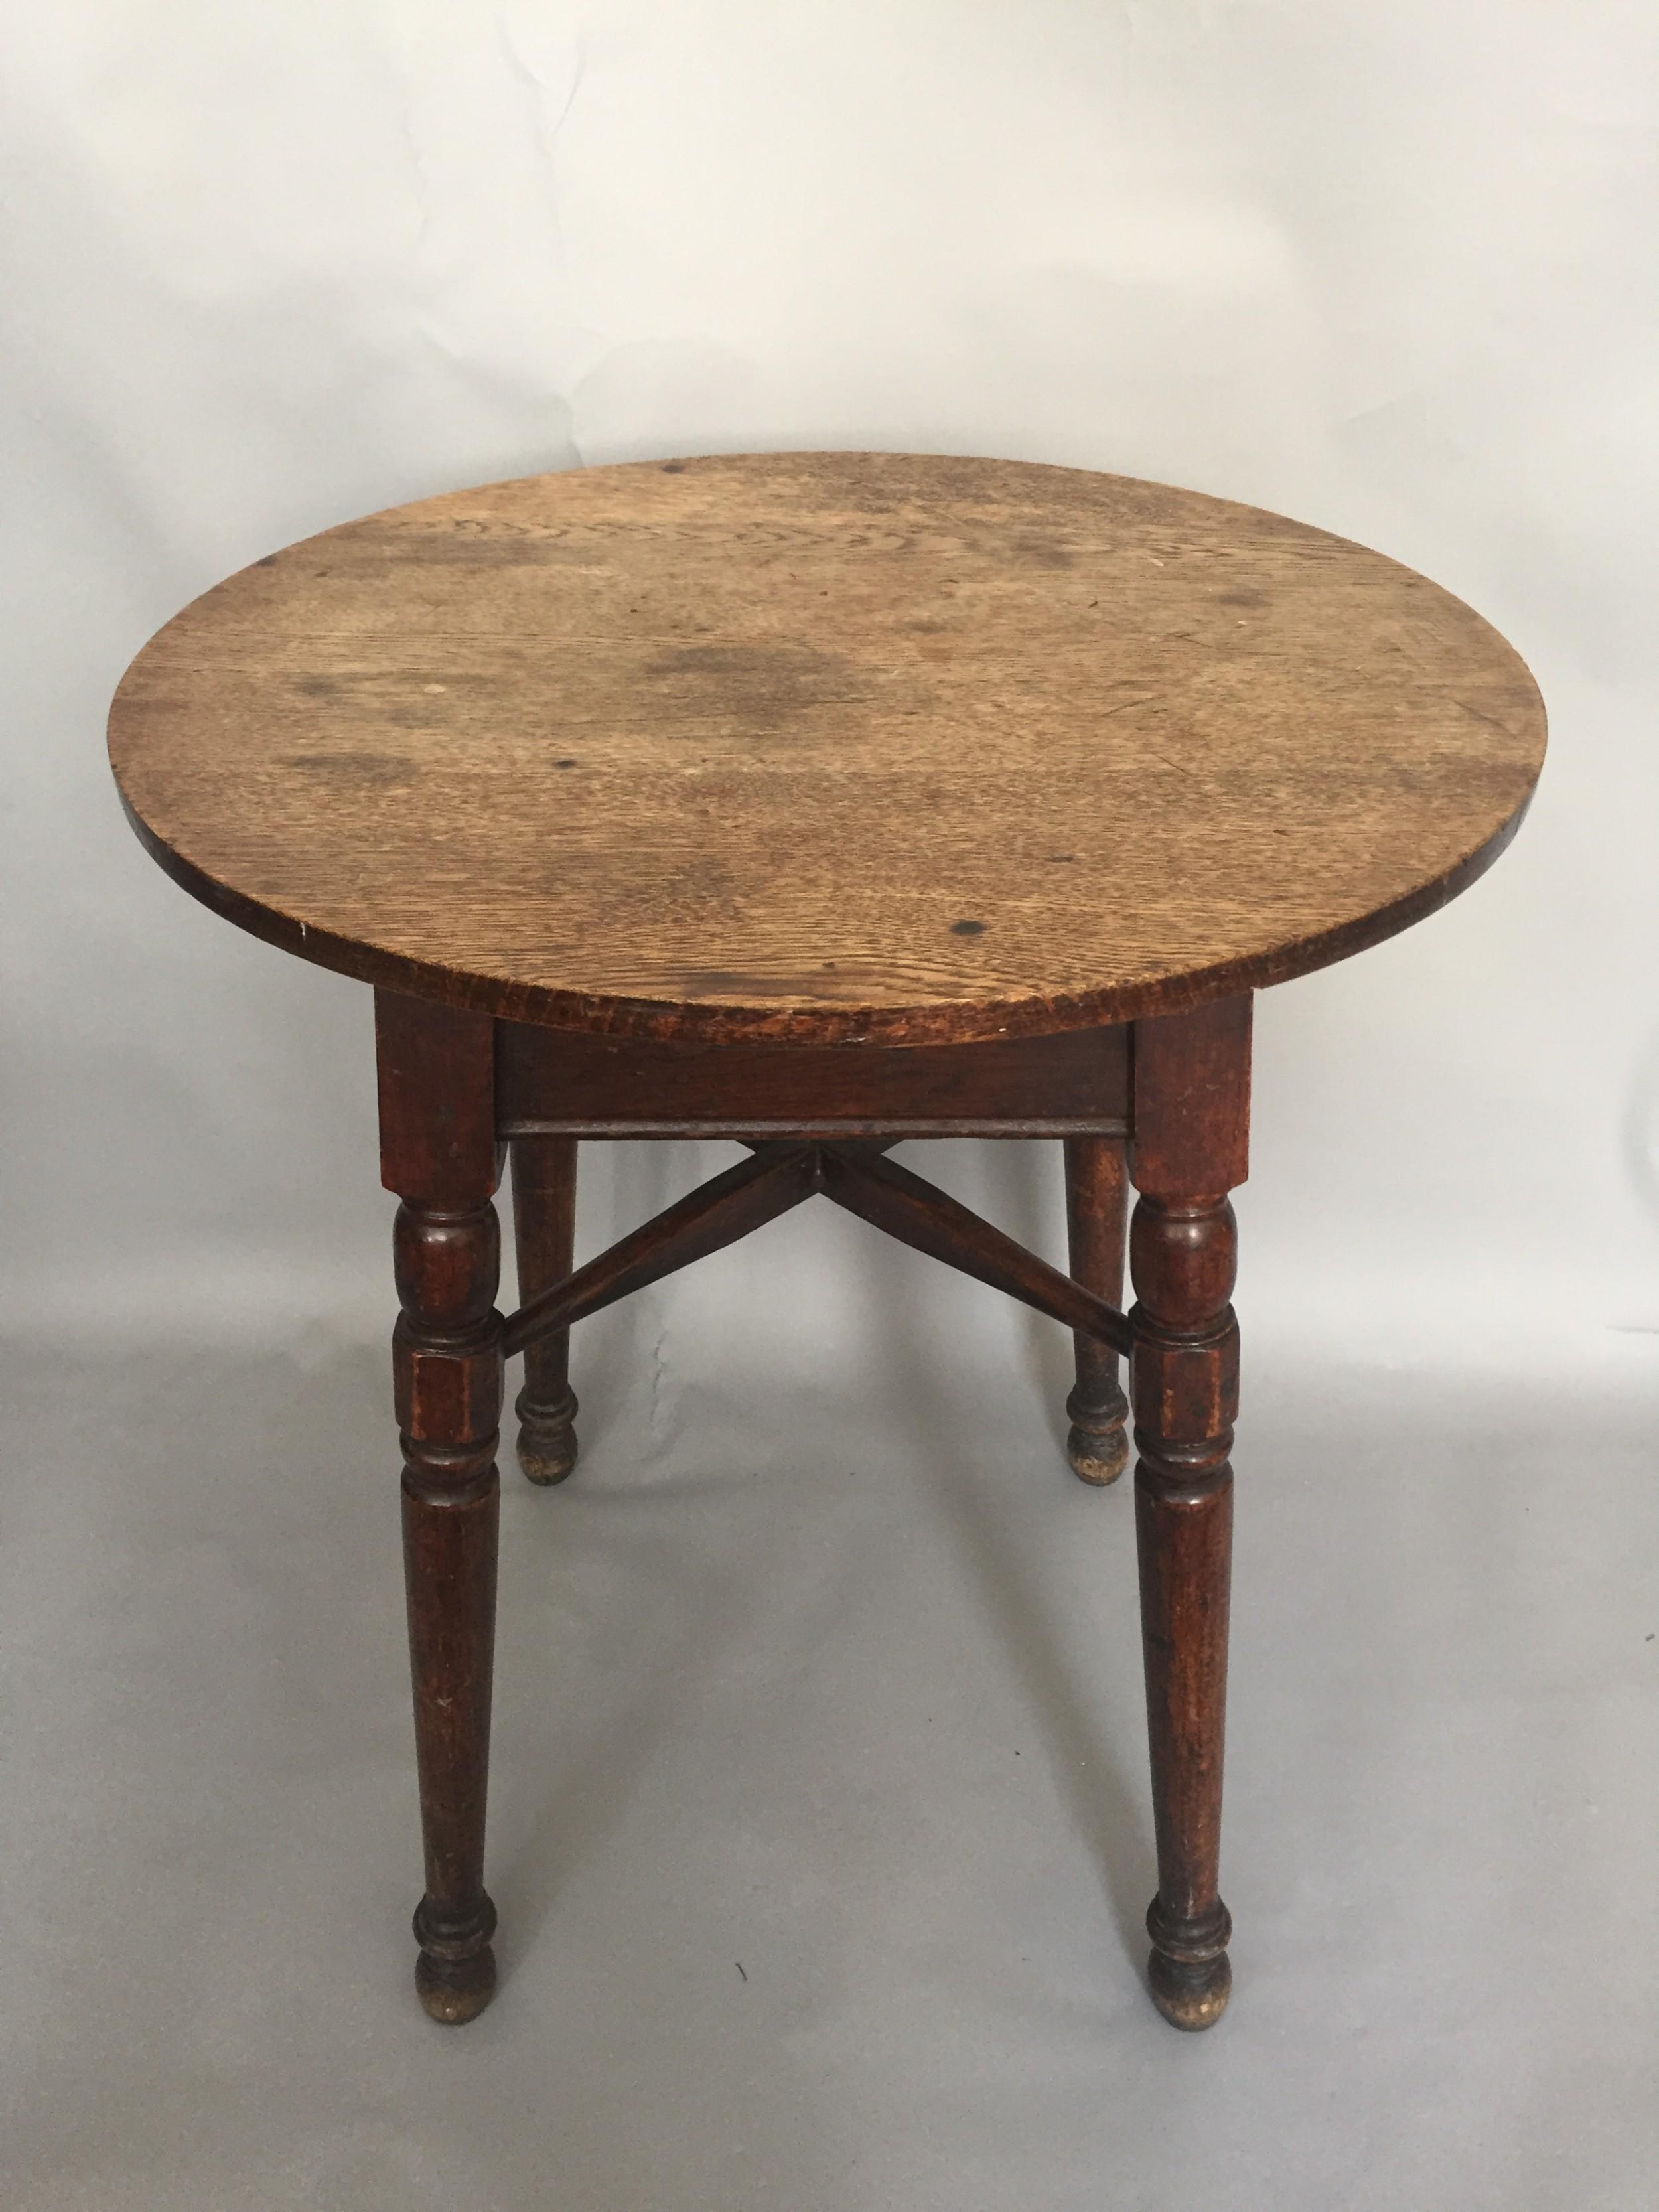 a 19thc oak topped tavern table